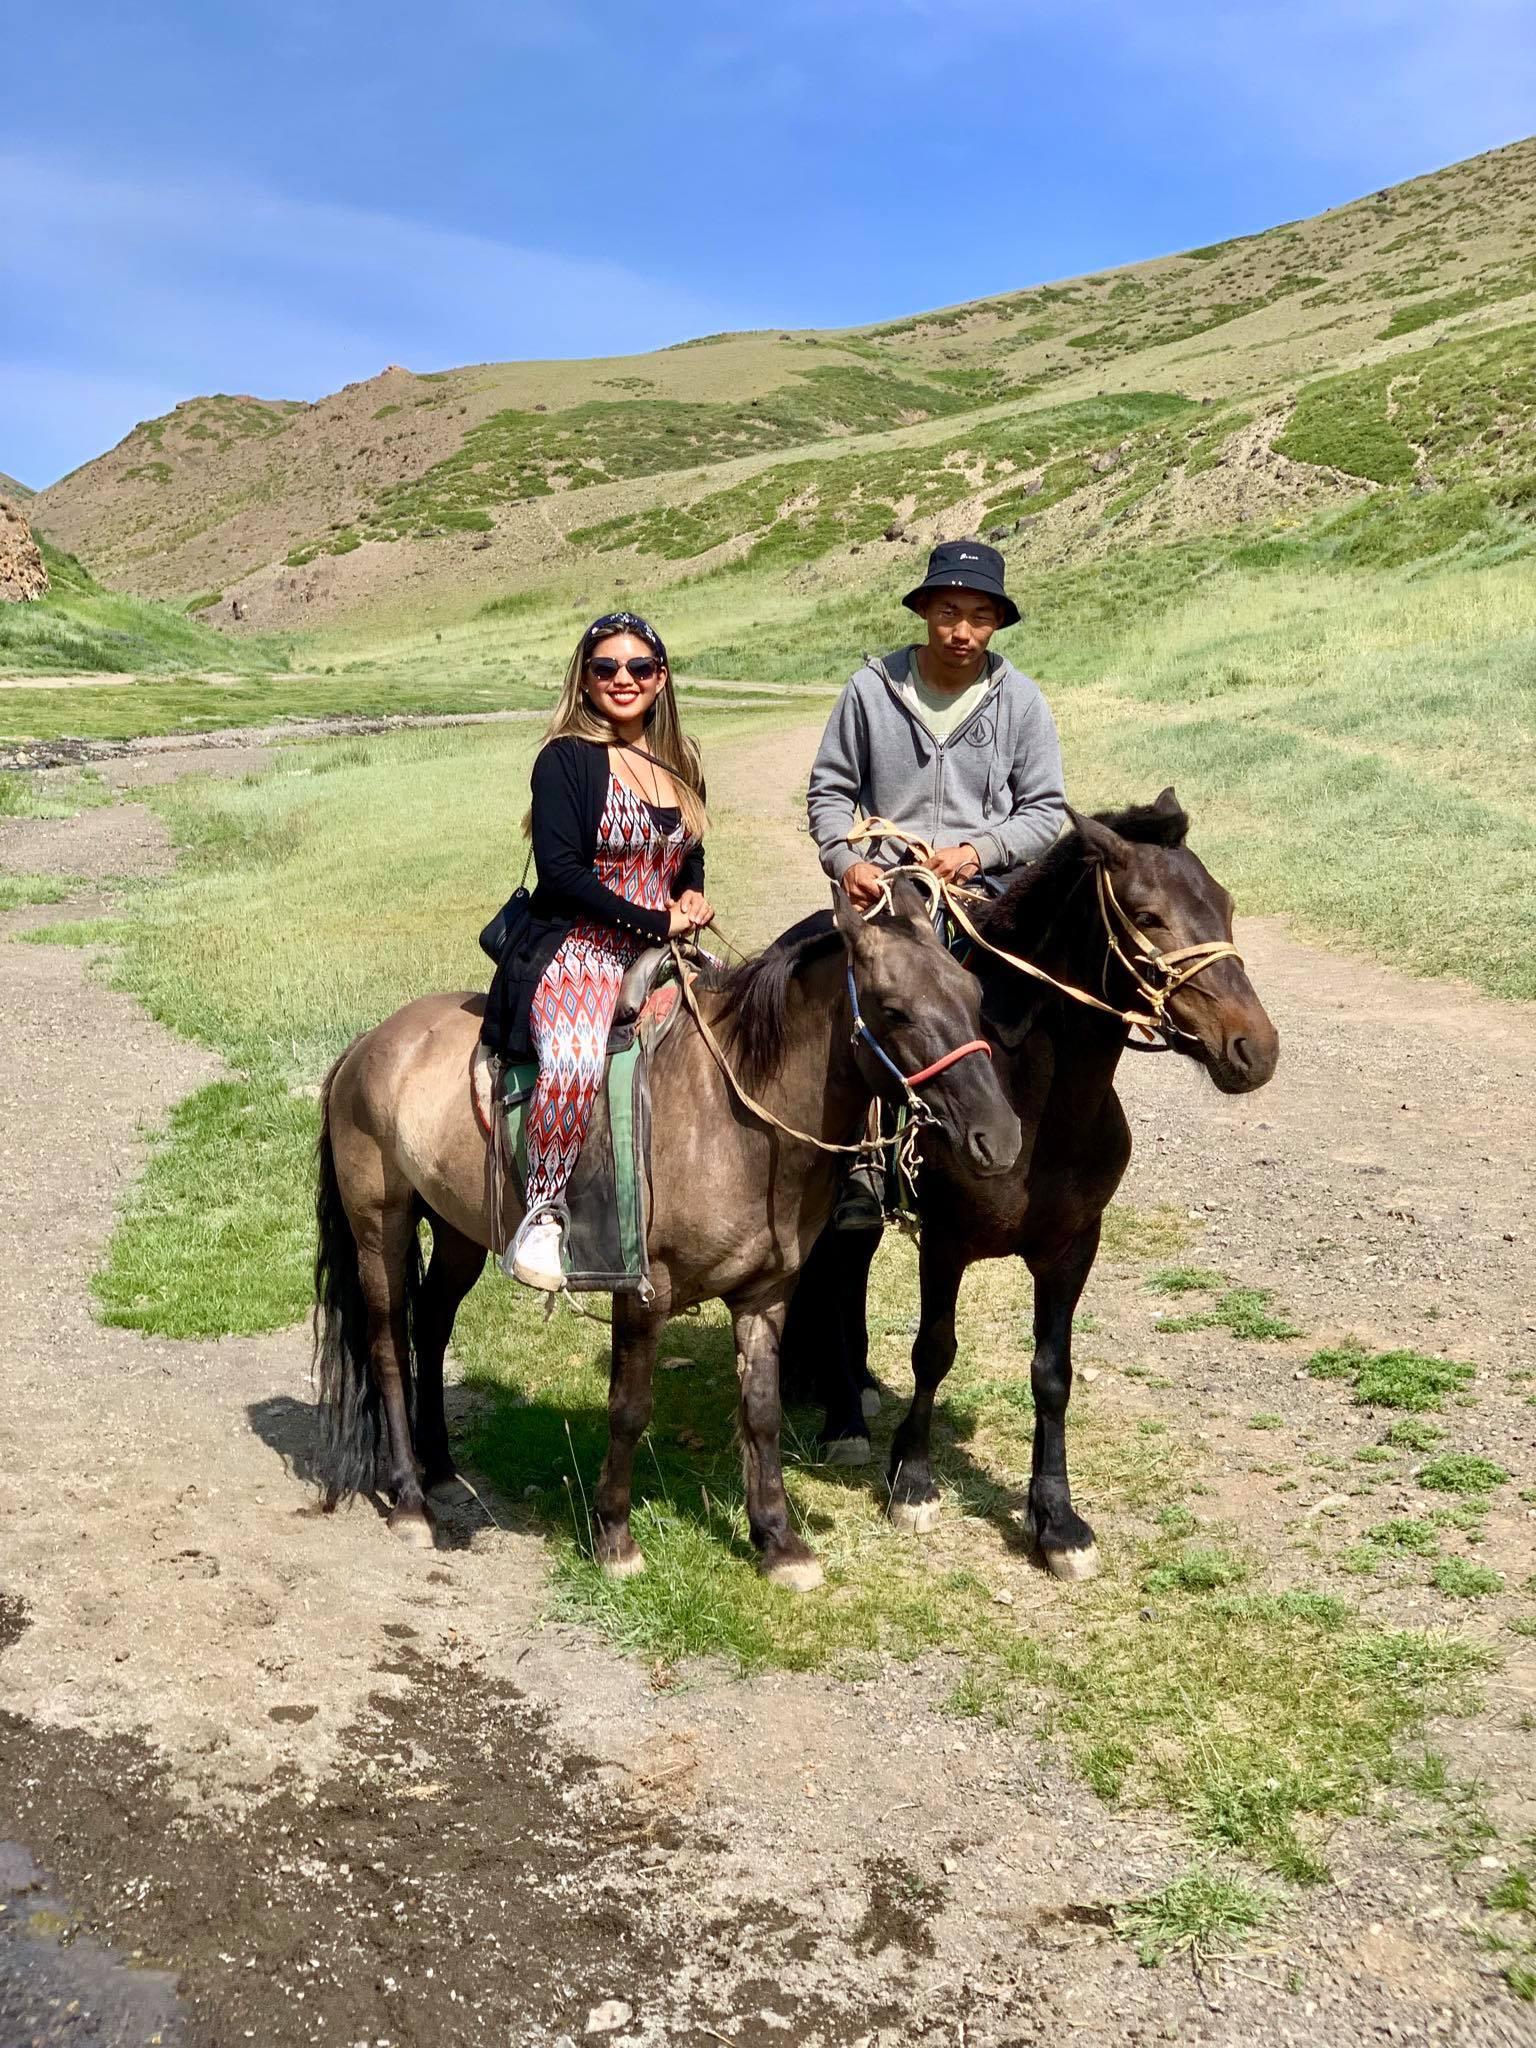 Kach Solo Travels in 2019 Horseback riding trip to the Gobi Gurvan Saikhan National Park1.jpg